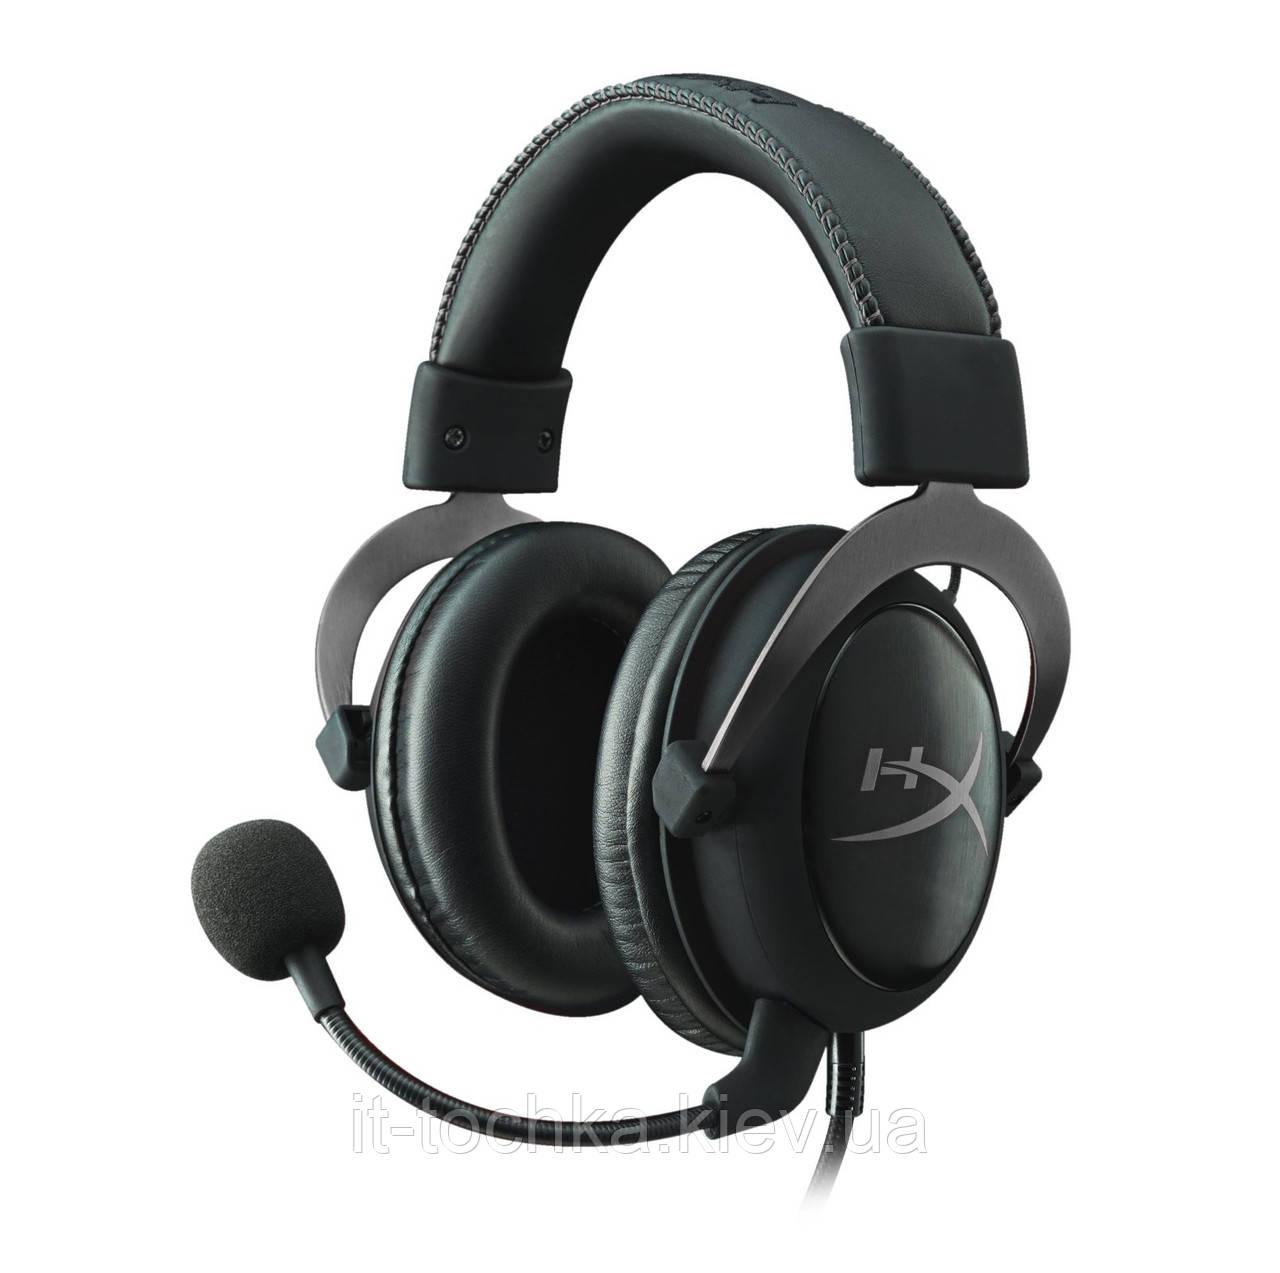 Игровая гарнитура kingston hyperx cloud ii gaming headset gun metal (khx-hscp-gm)